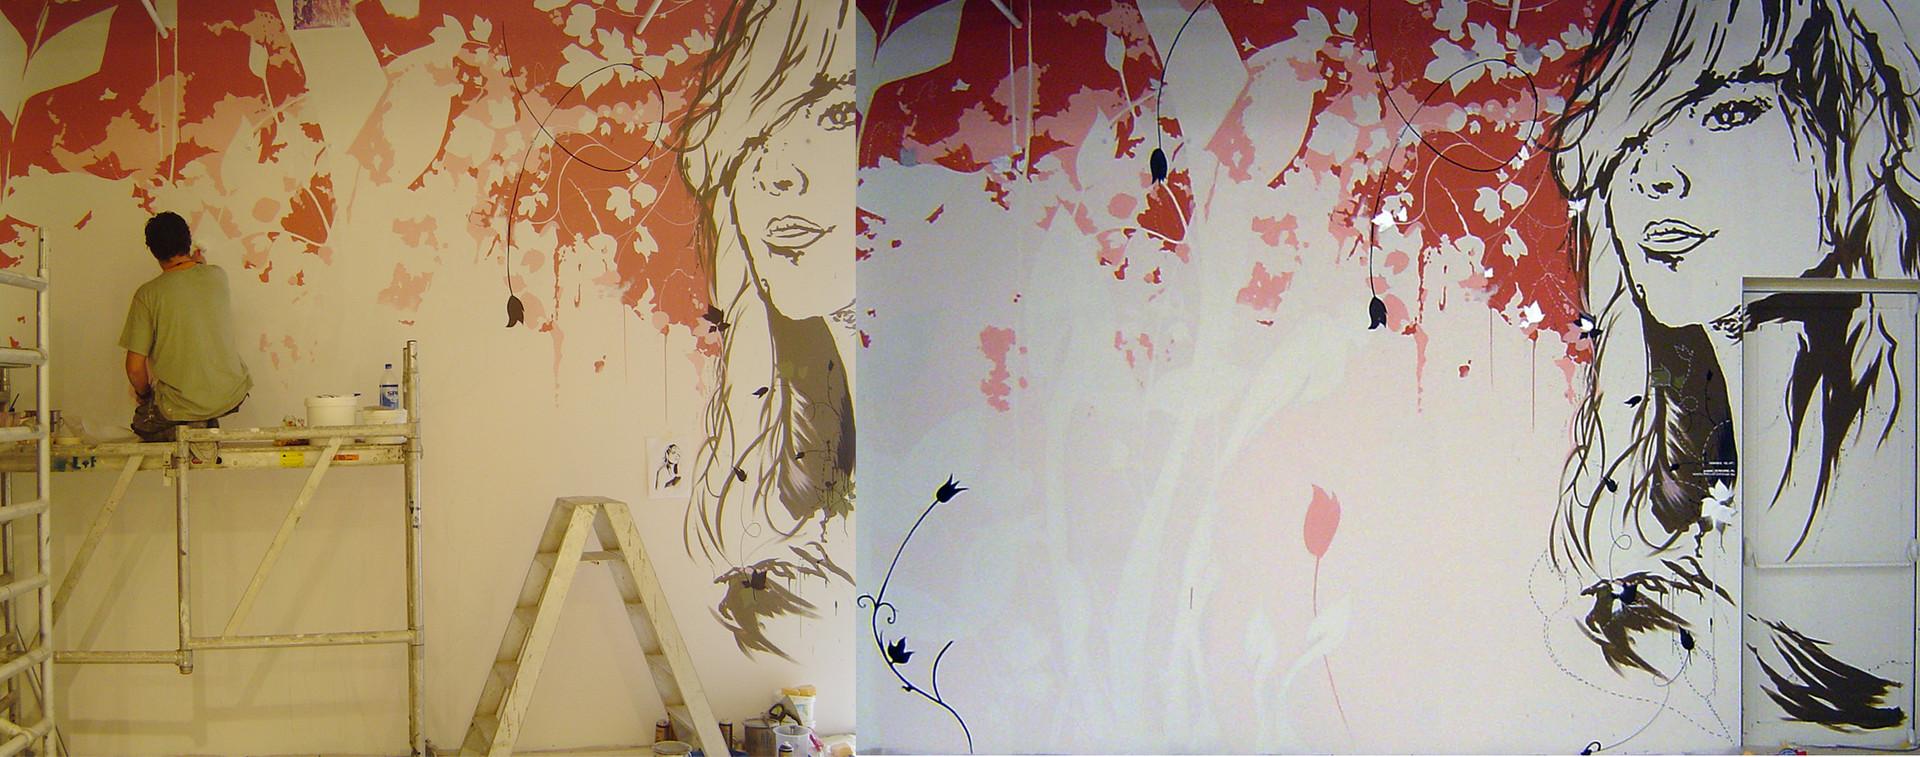 MONS wall art for WonderWoman store